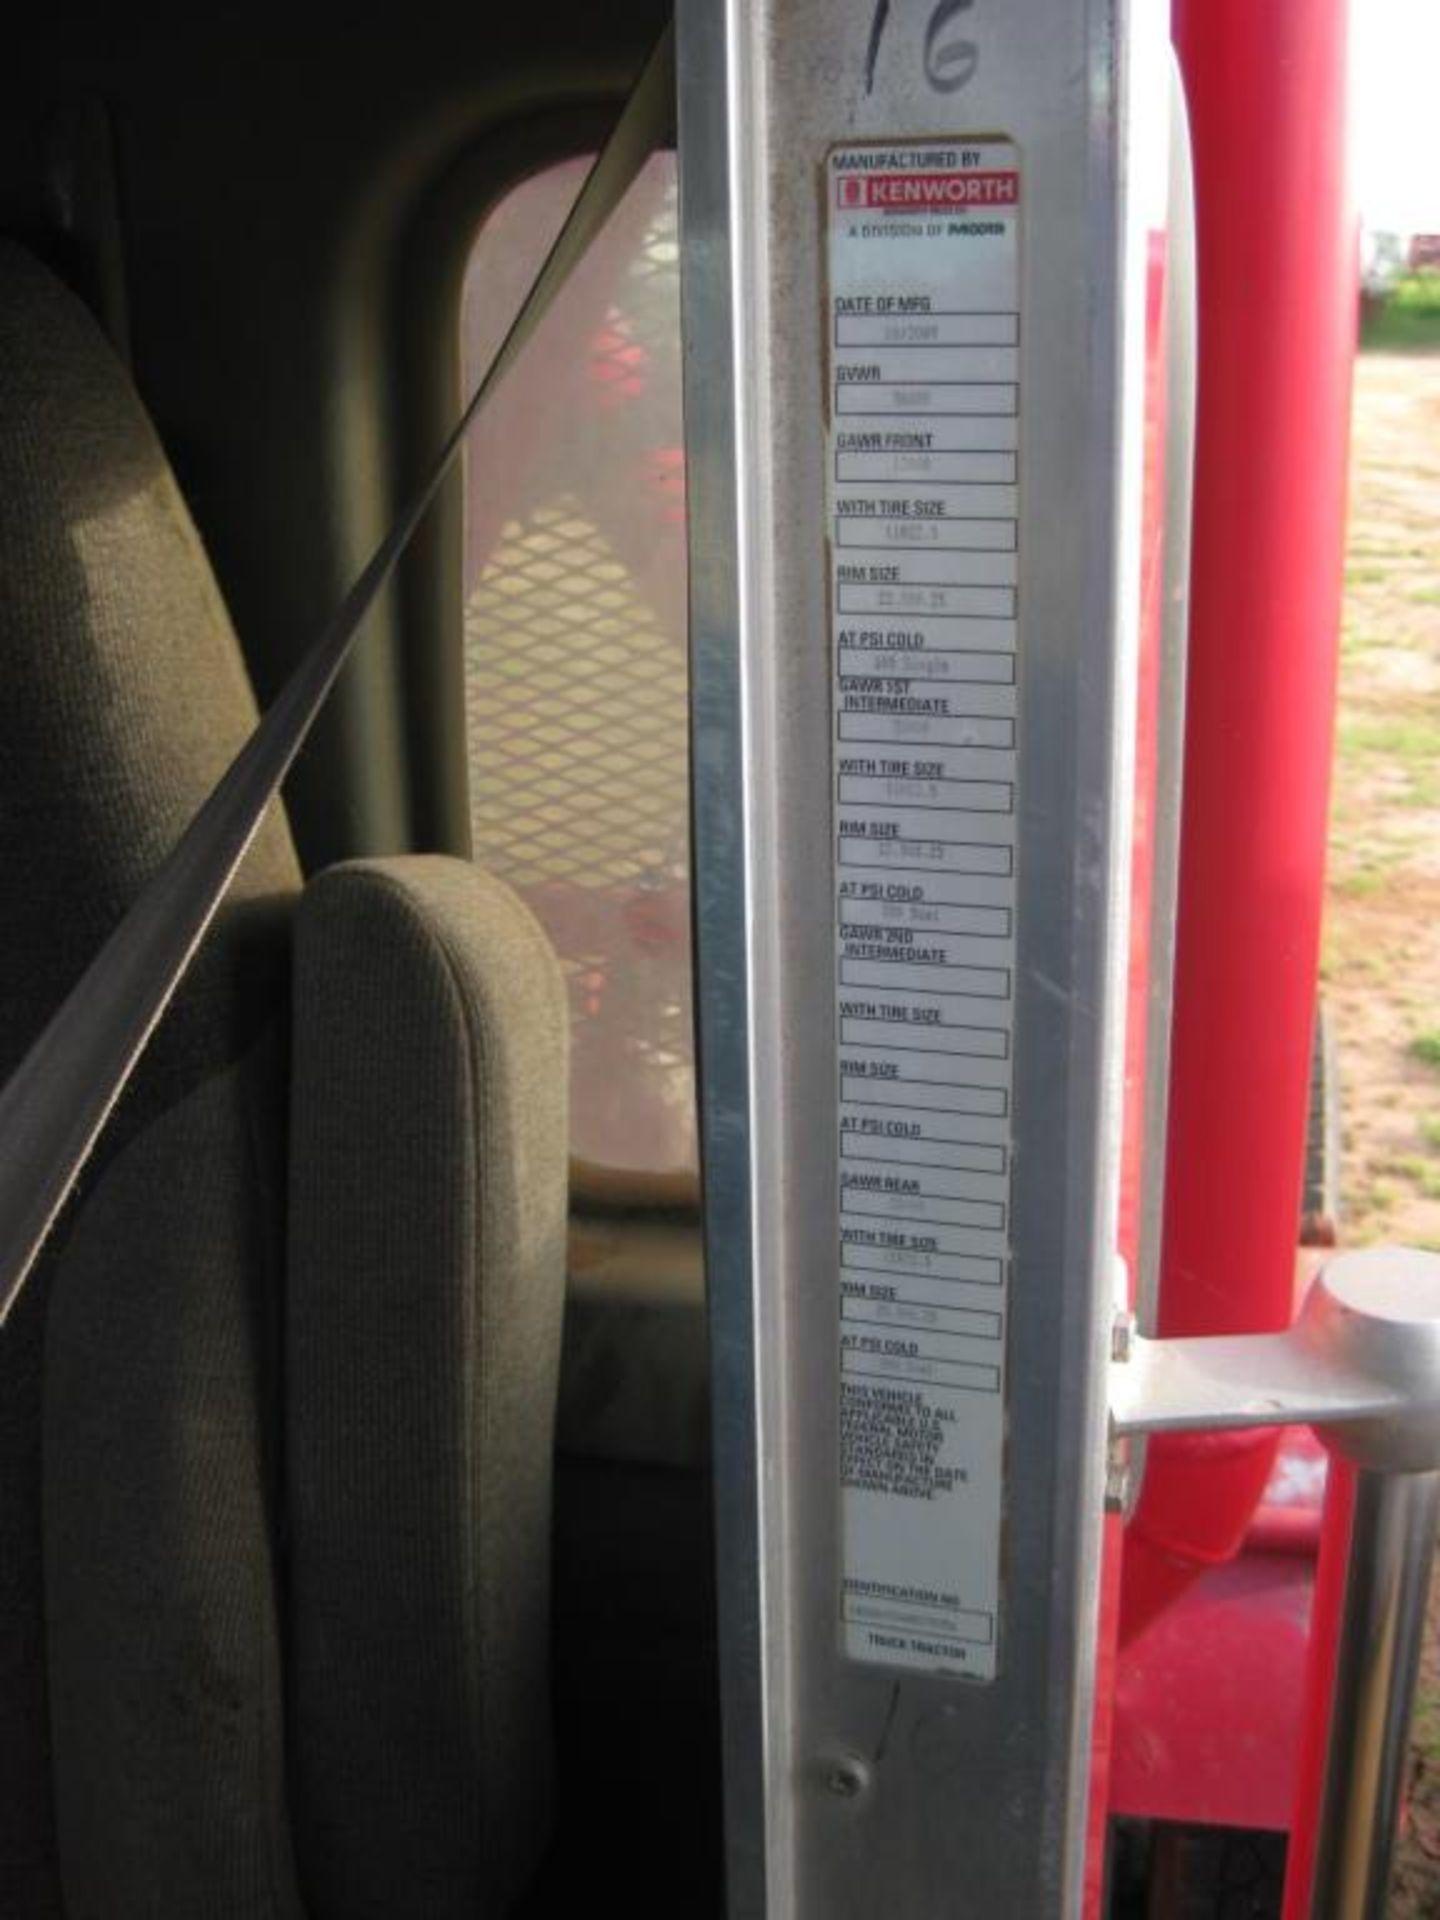 Kenworth Winch Truck - Image 20 of 22